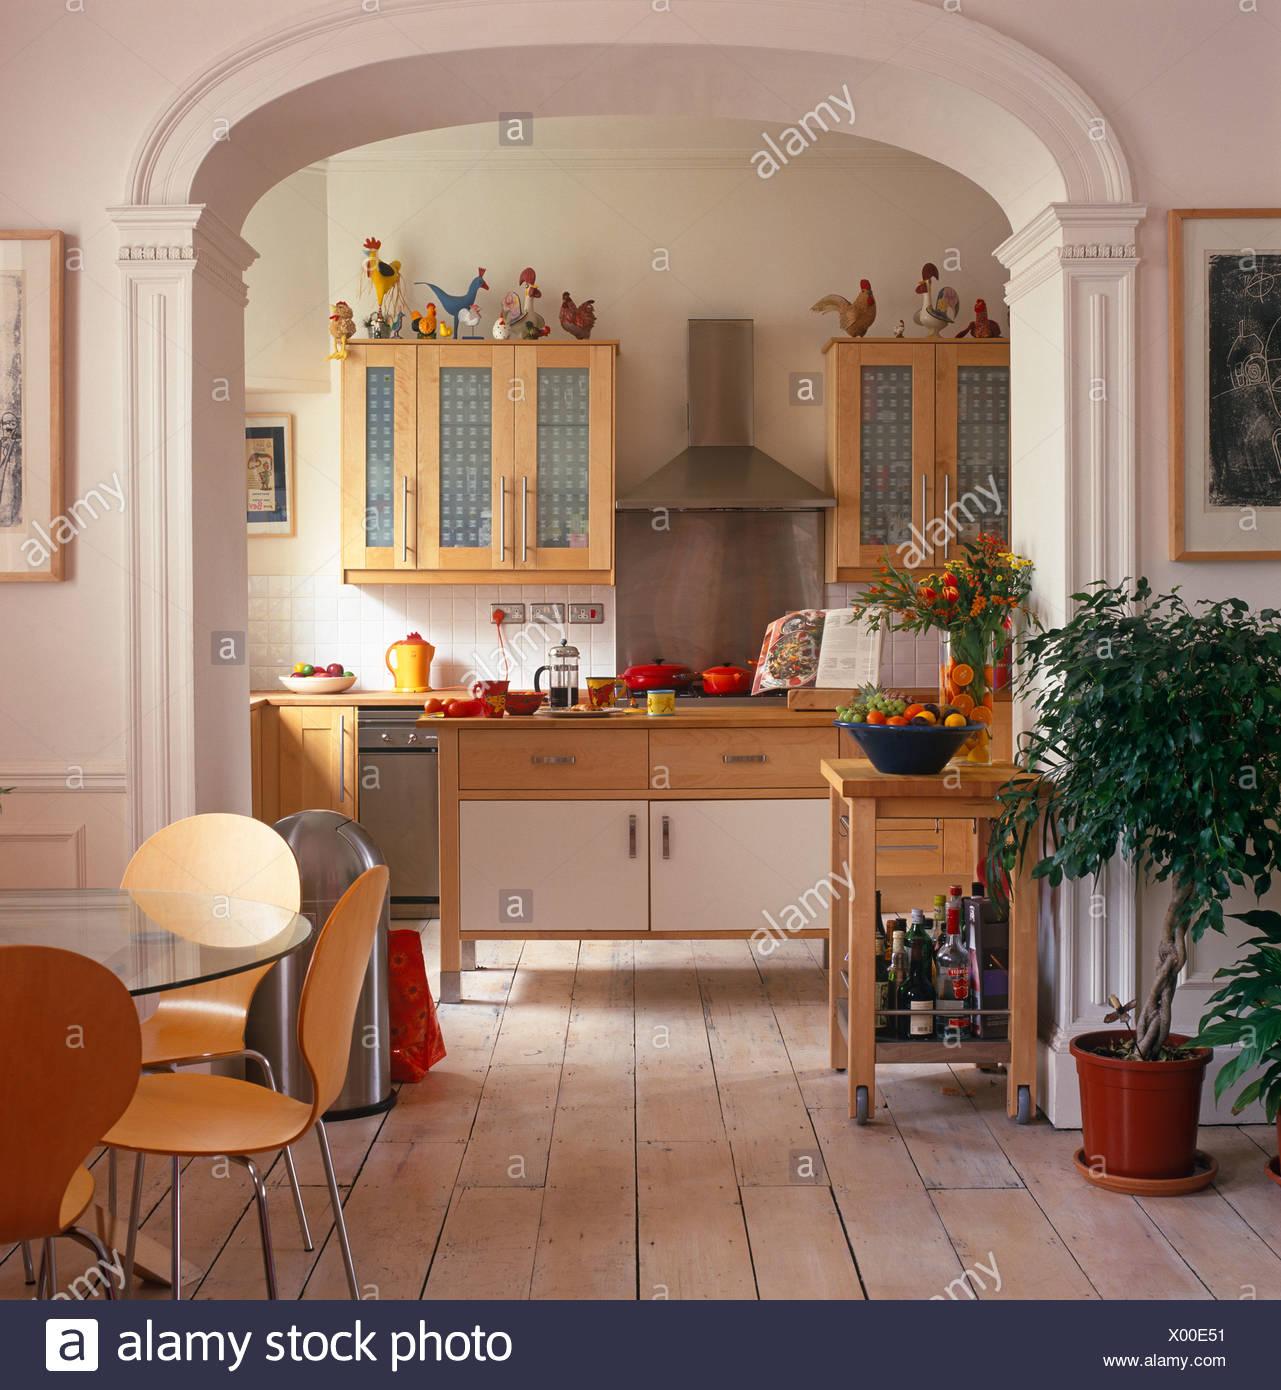 Arco Tra Cucina E Sala.Arne Jacobsen Sedie Di Stile In Sala Da Pranzo Con Parquet E Ficus